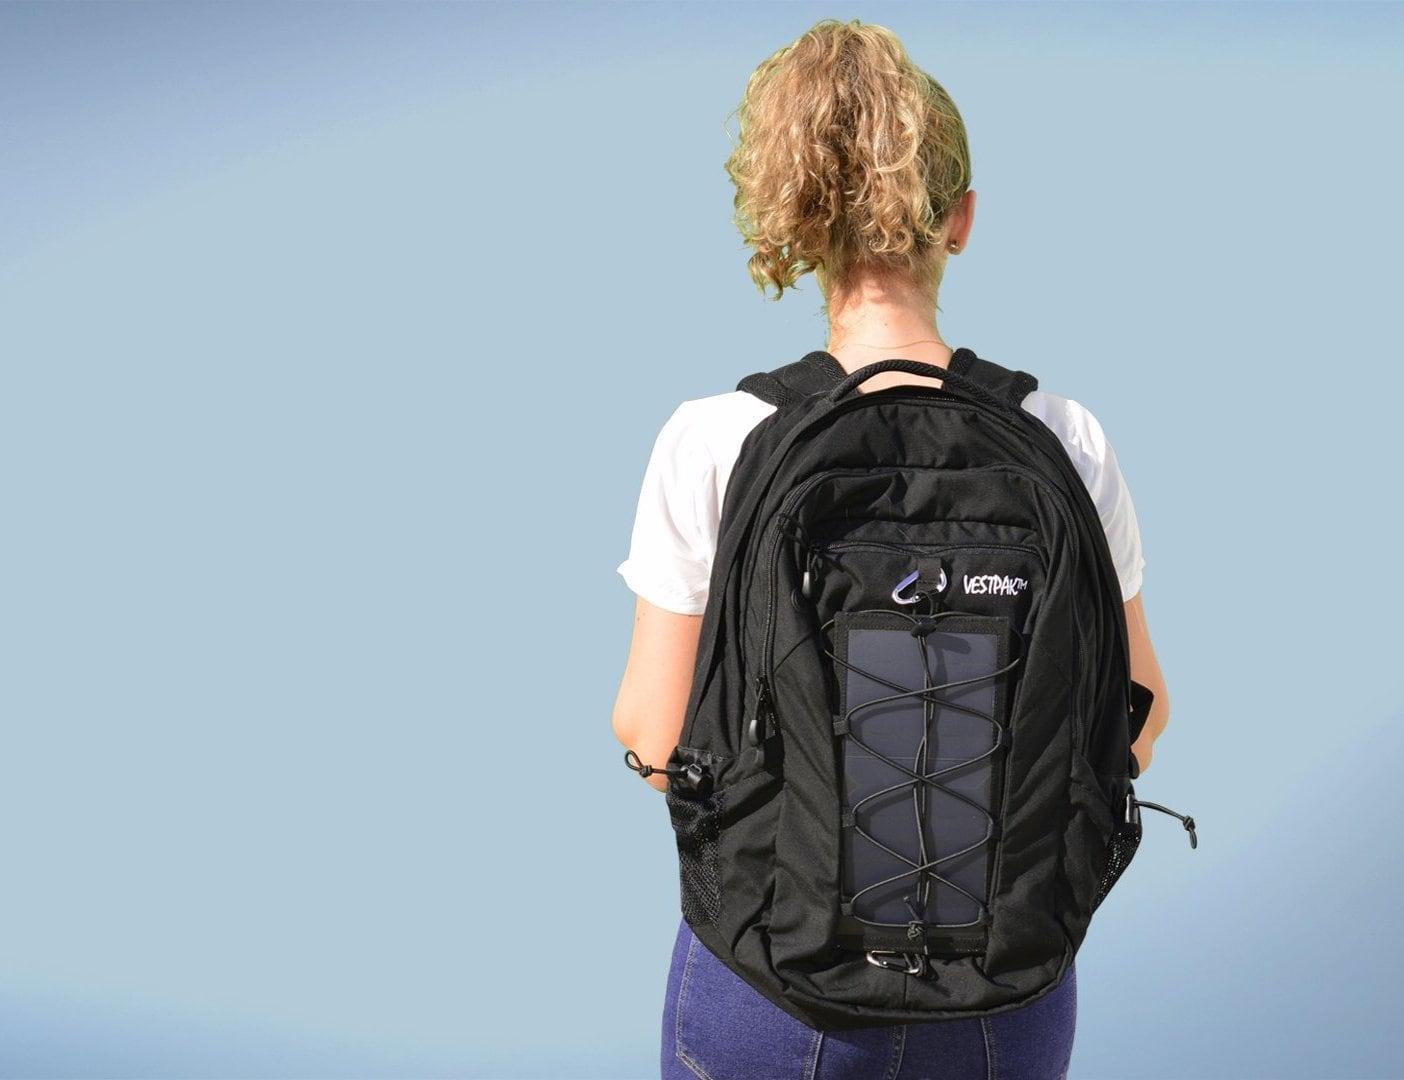 VESTPAK Protector Lightweight Bulletproof Backpack